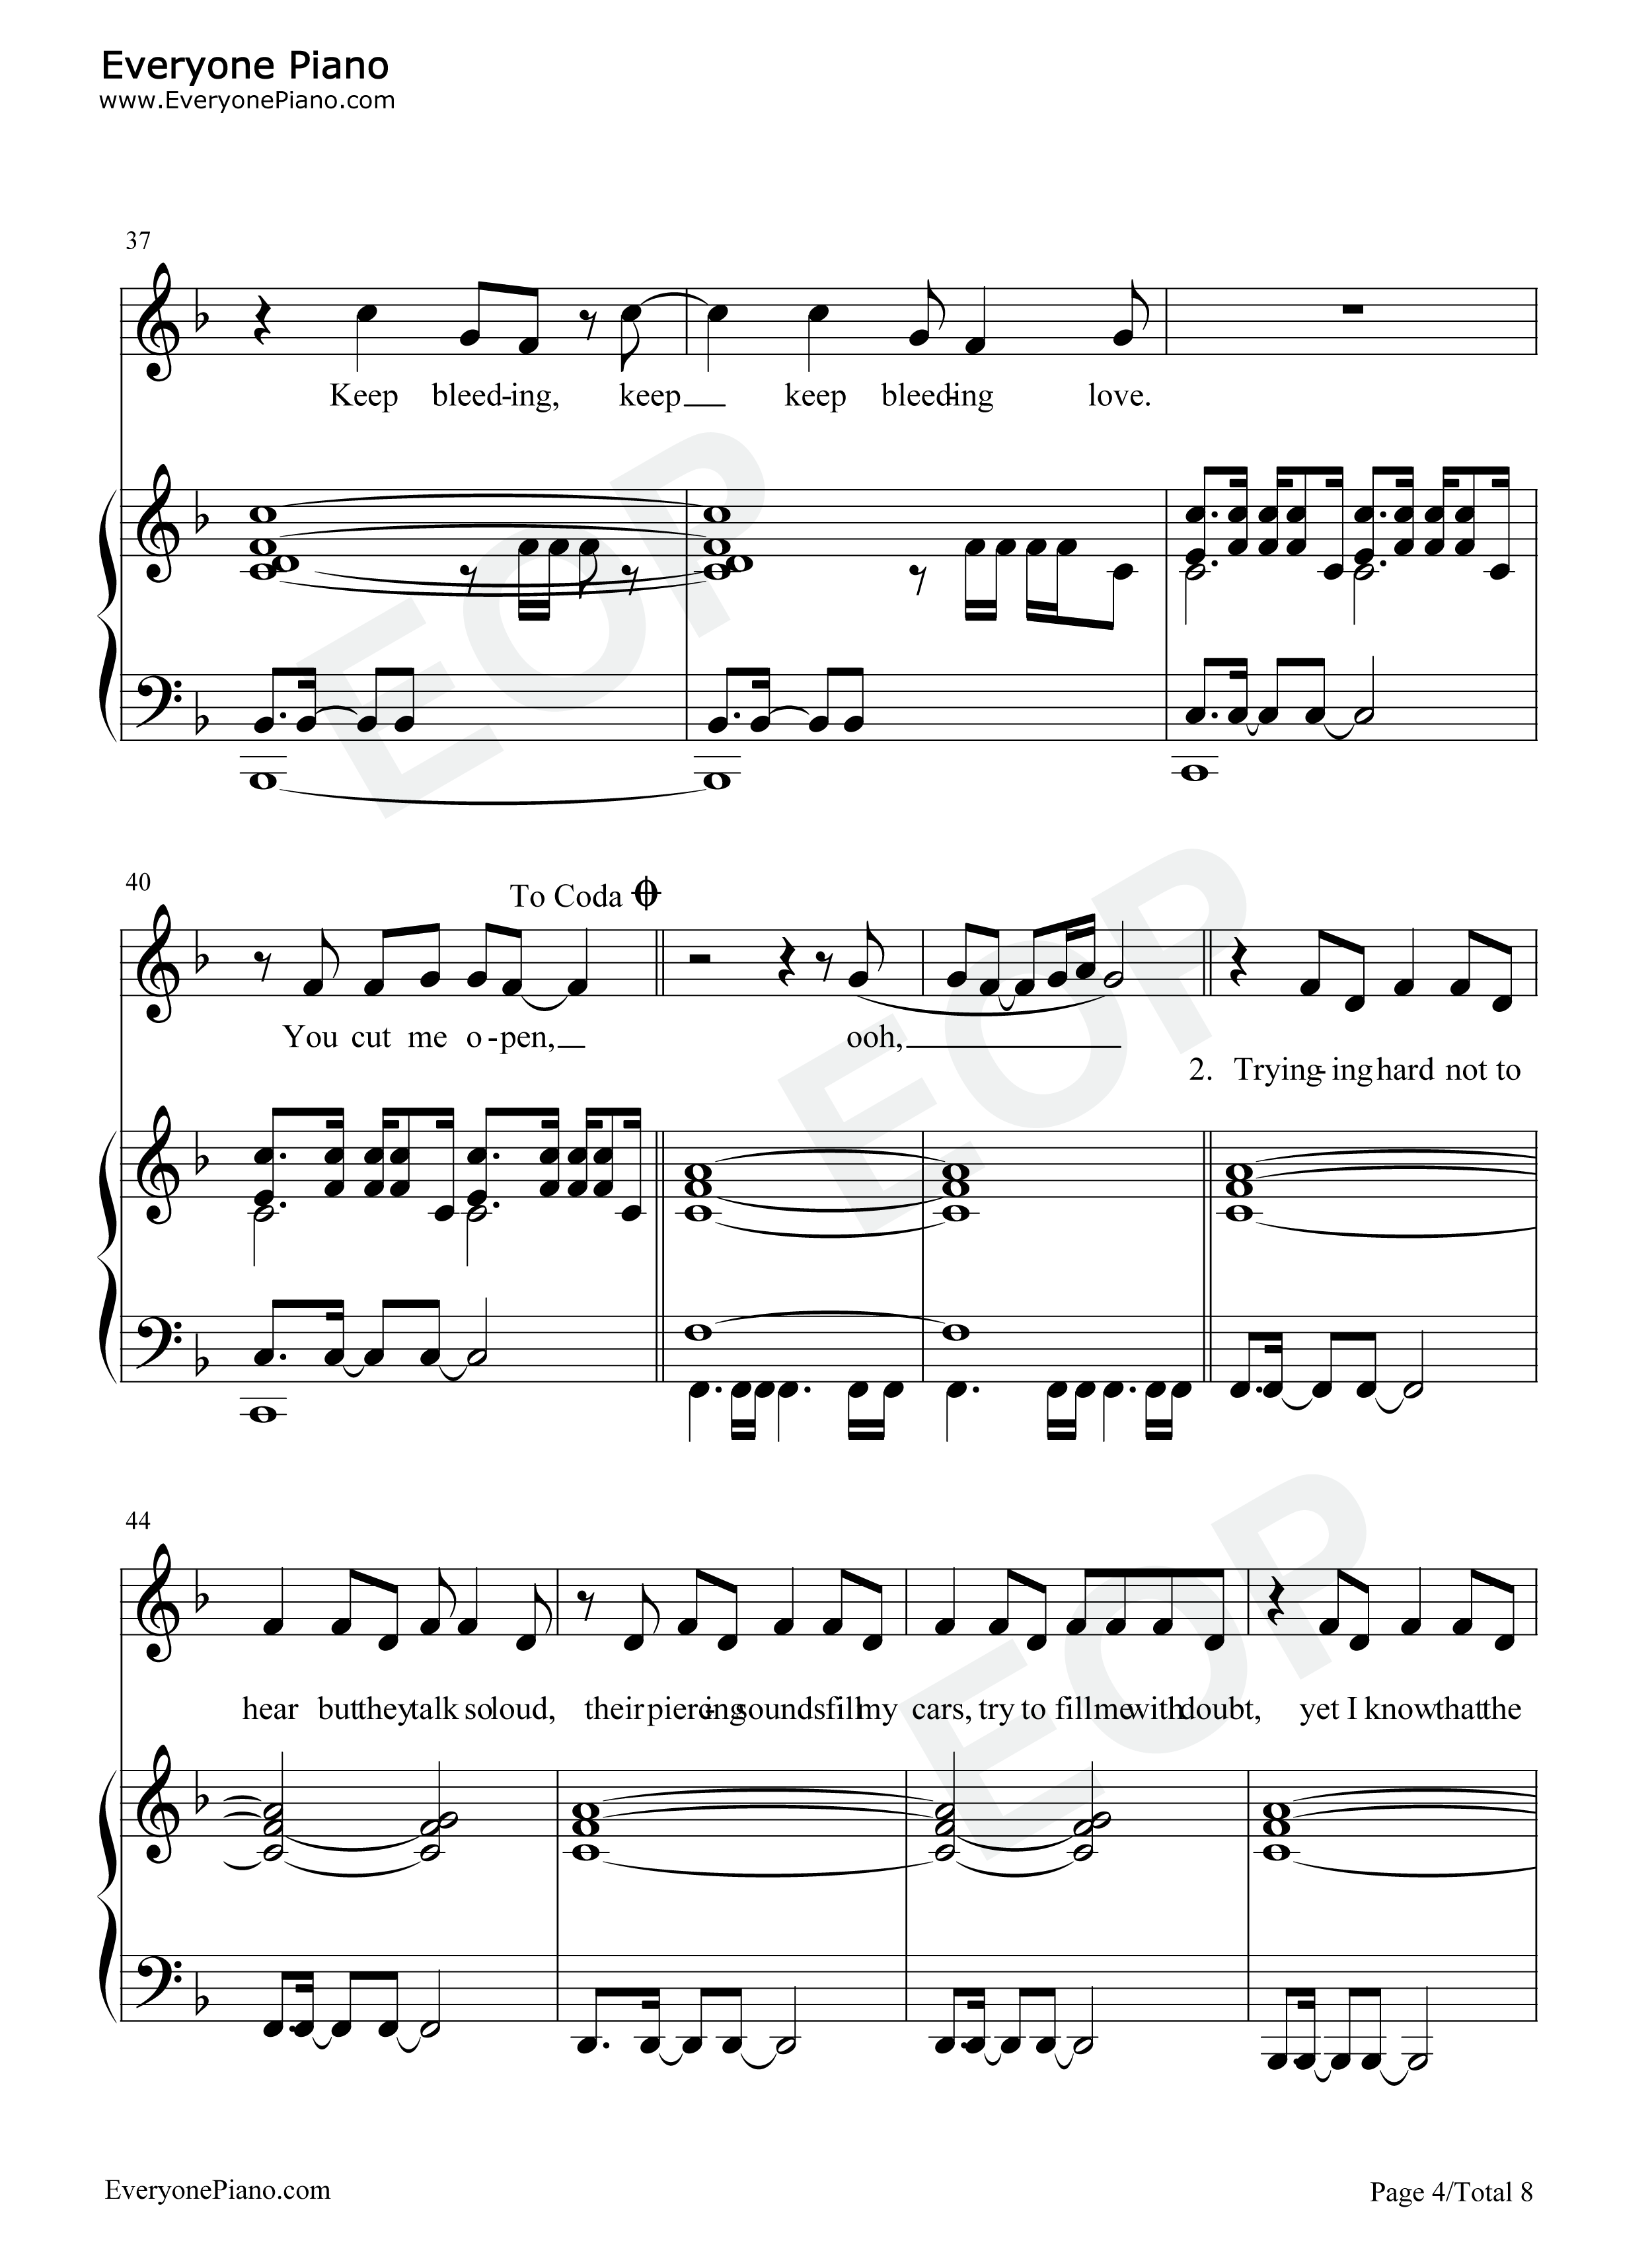 Leona Lewis - Bleeding Love (Chords) - Ultimate Guitar Archive